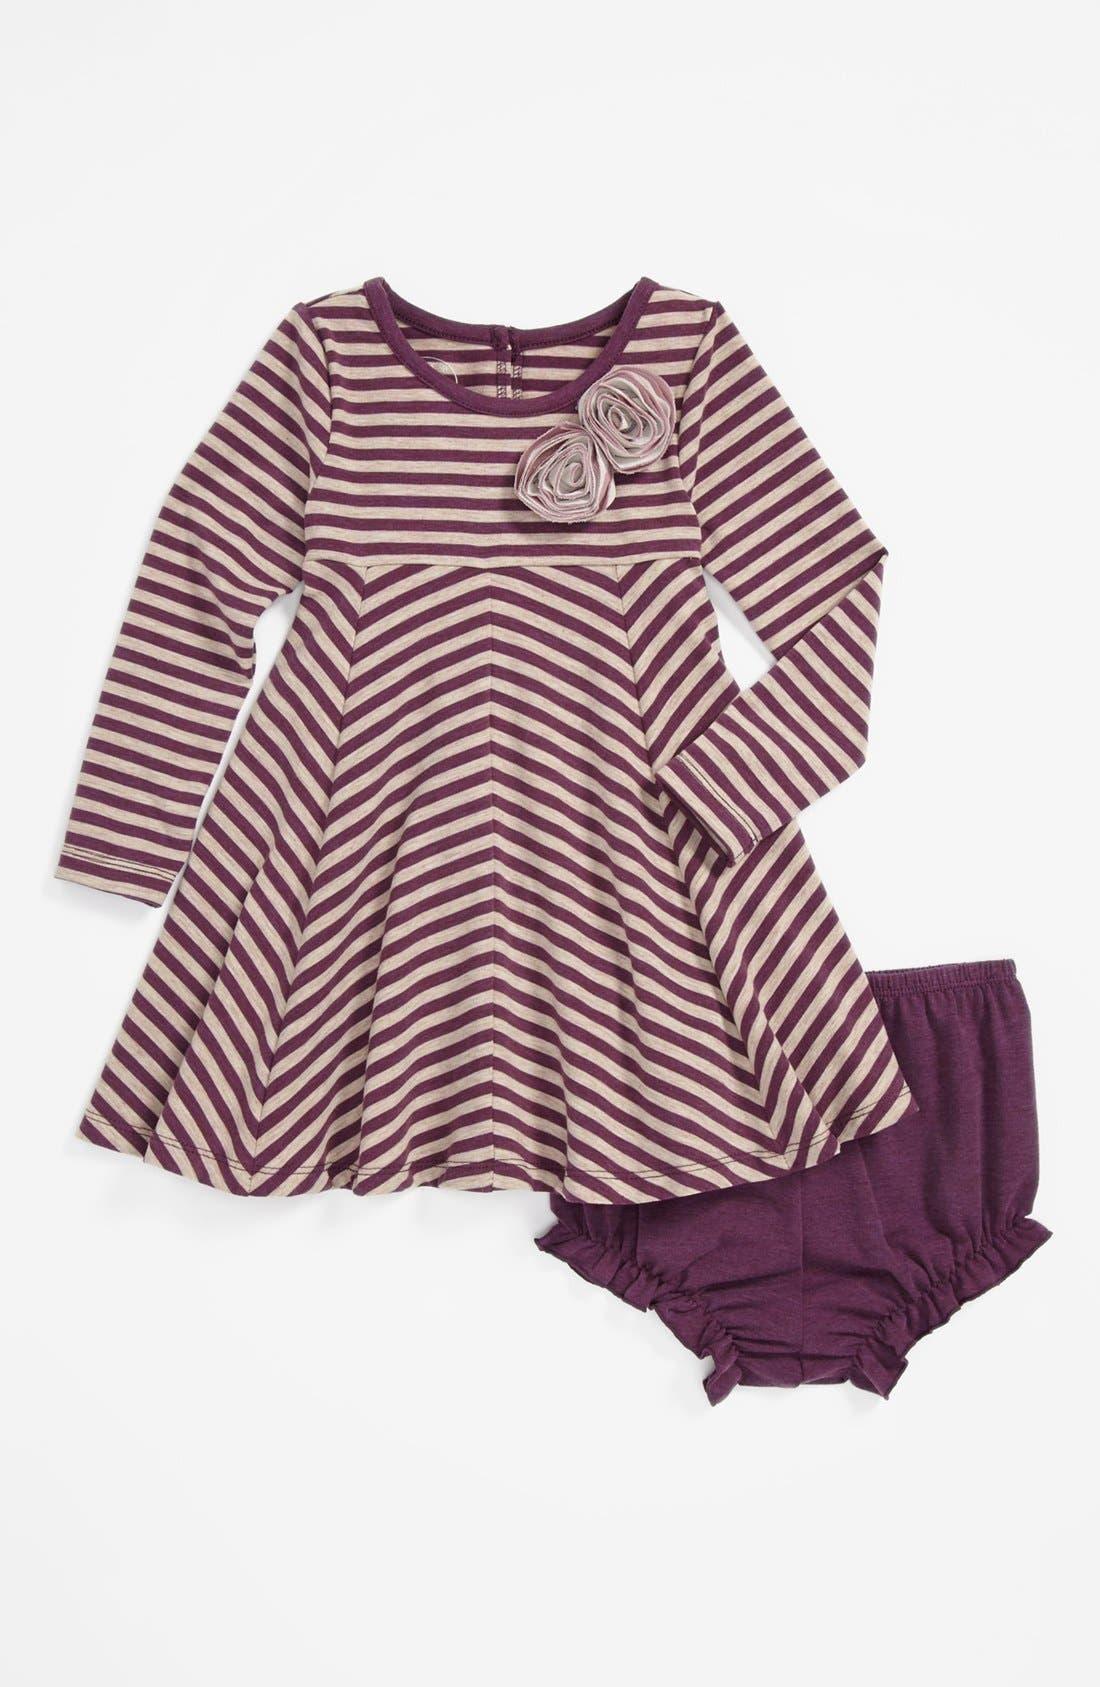 Main Image - Pippa & Julie Stripe Dress & Bloomers (Baby Girls)